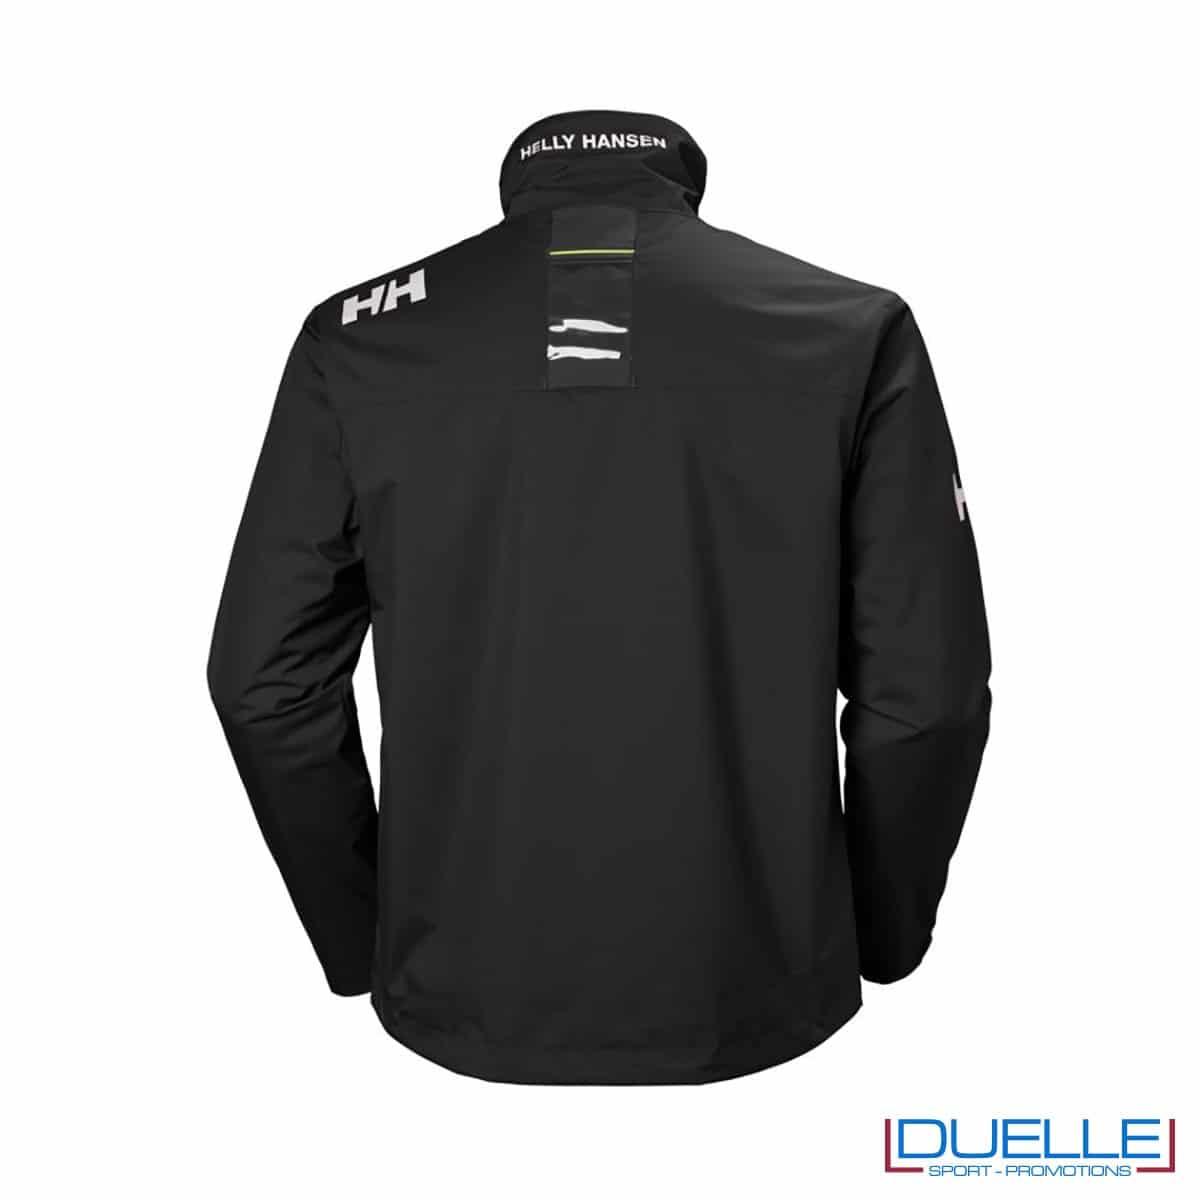 Helly Hansen Crew Midlayer jacket personalizzata colore nero